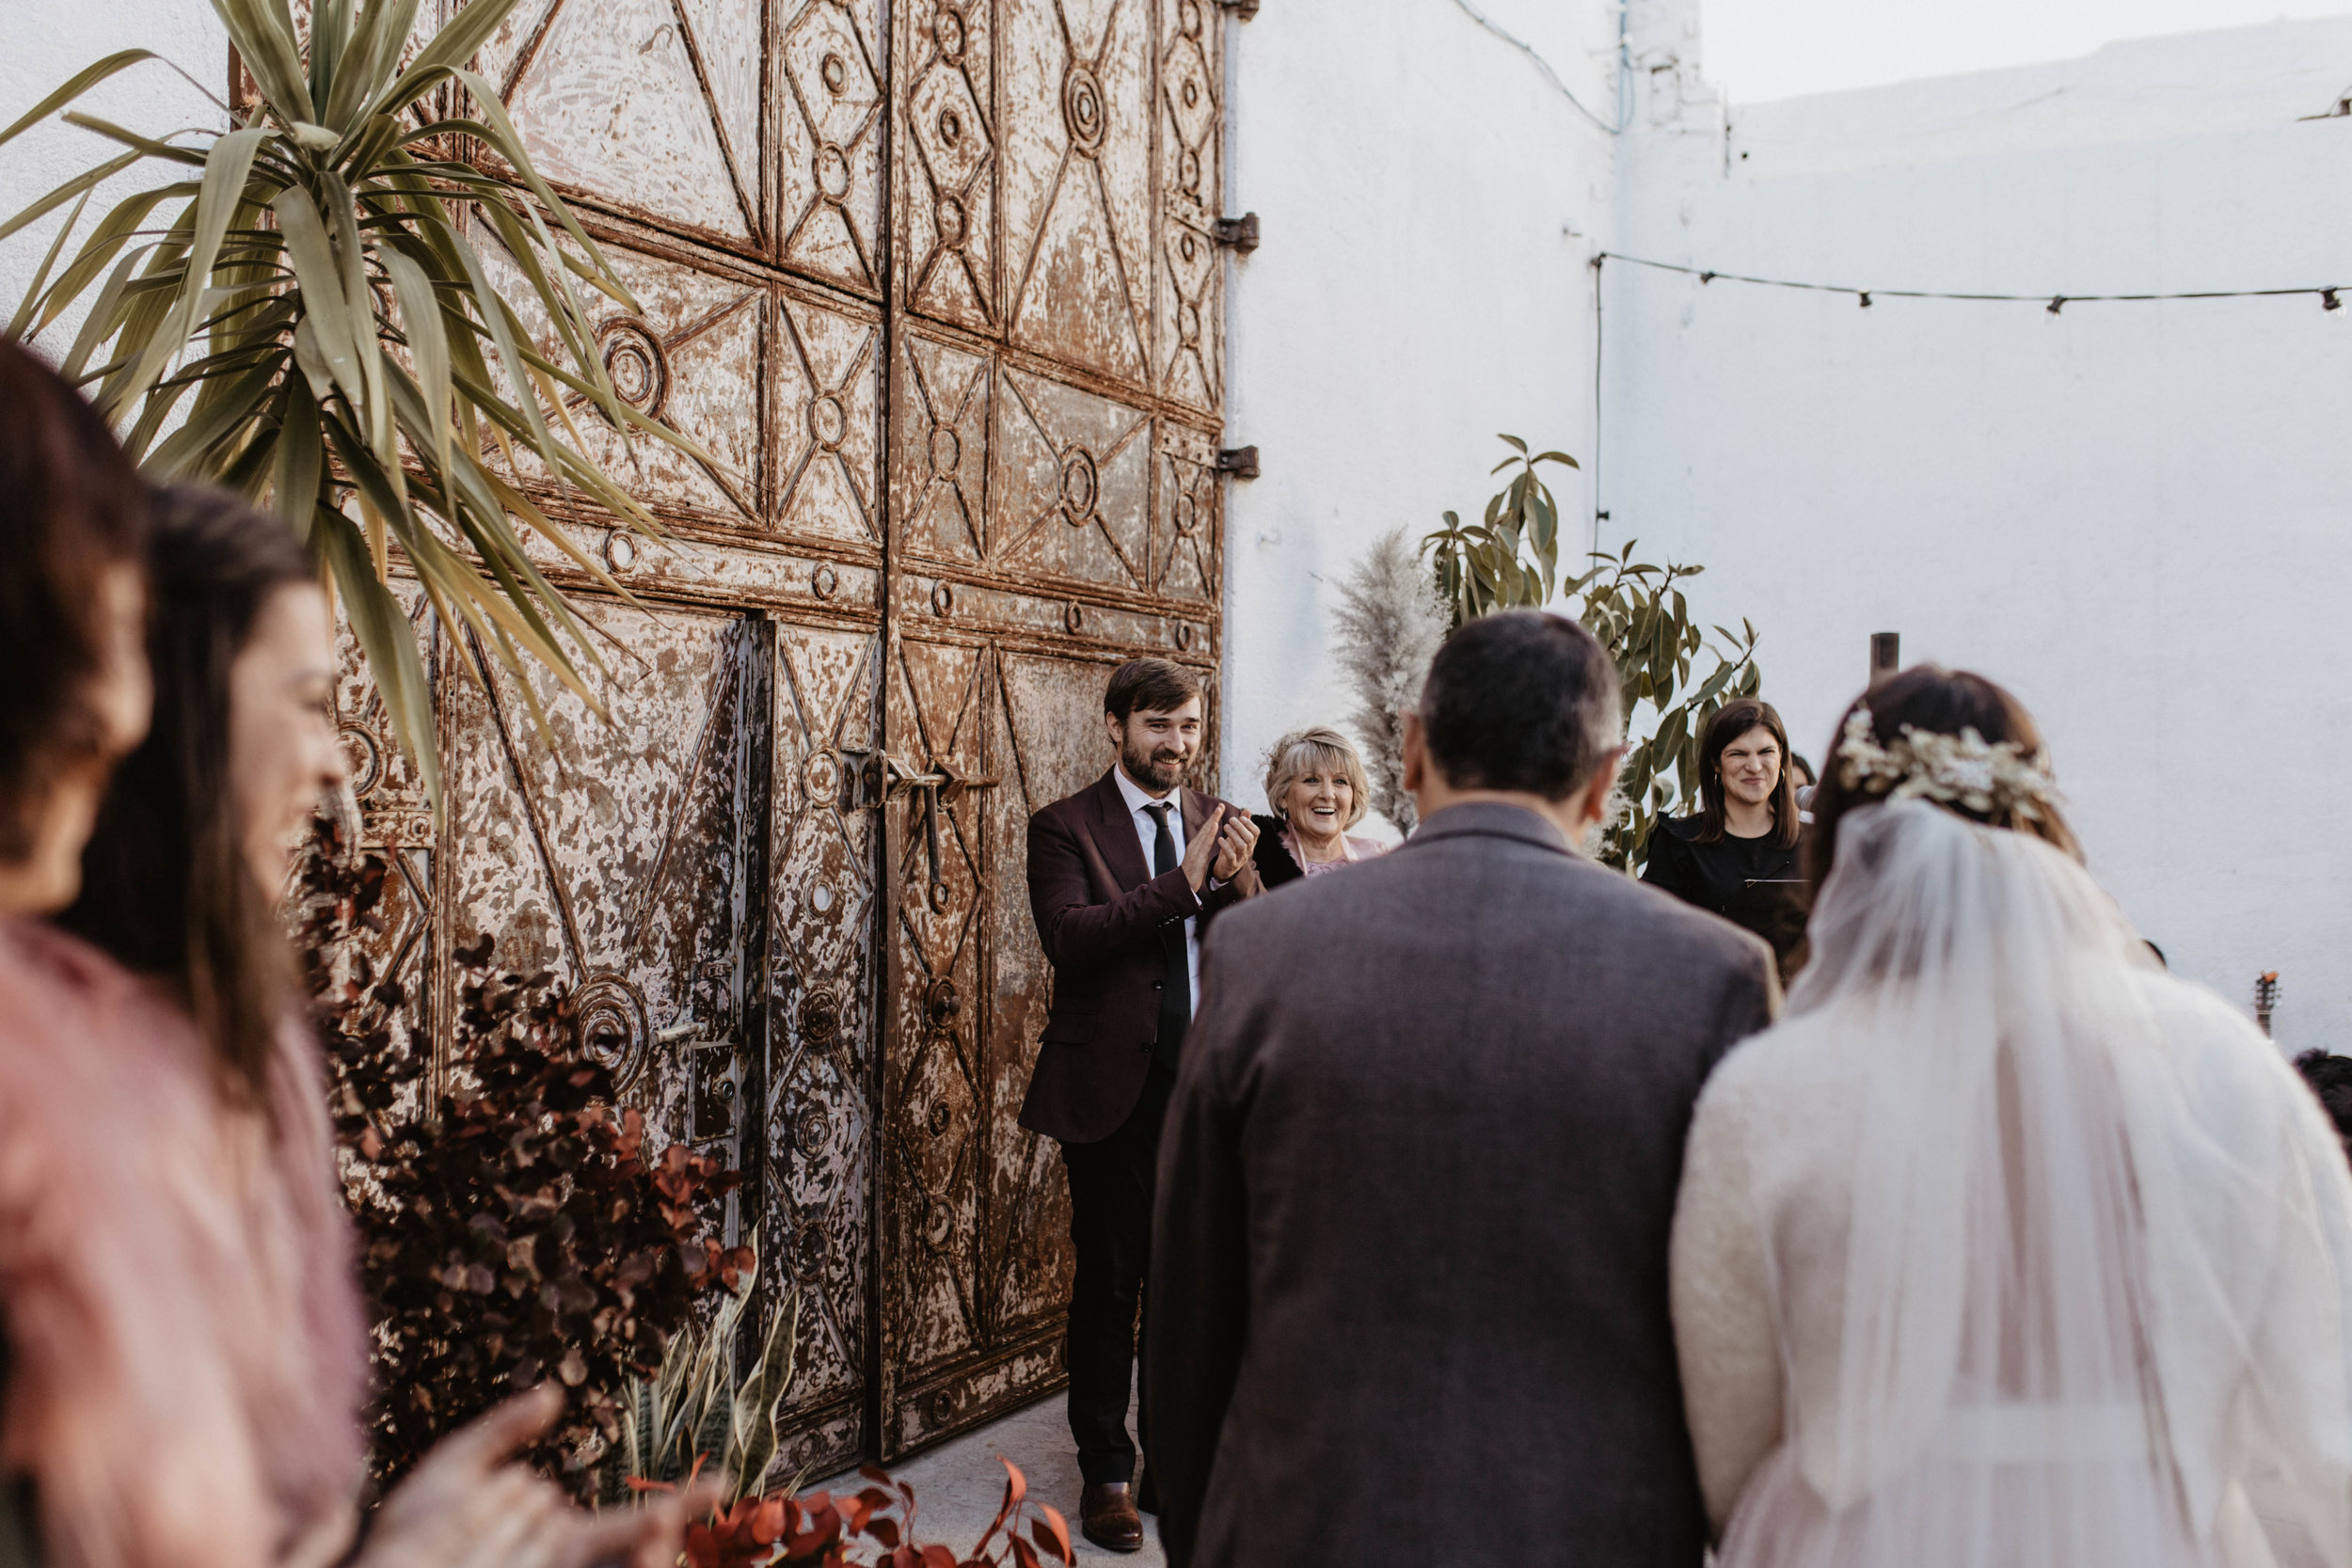 thenortherngirlphotography-photography-weddingphotography-couple-bodasconestilo-bodasenbarcelona-martadavid-556.jpg